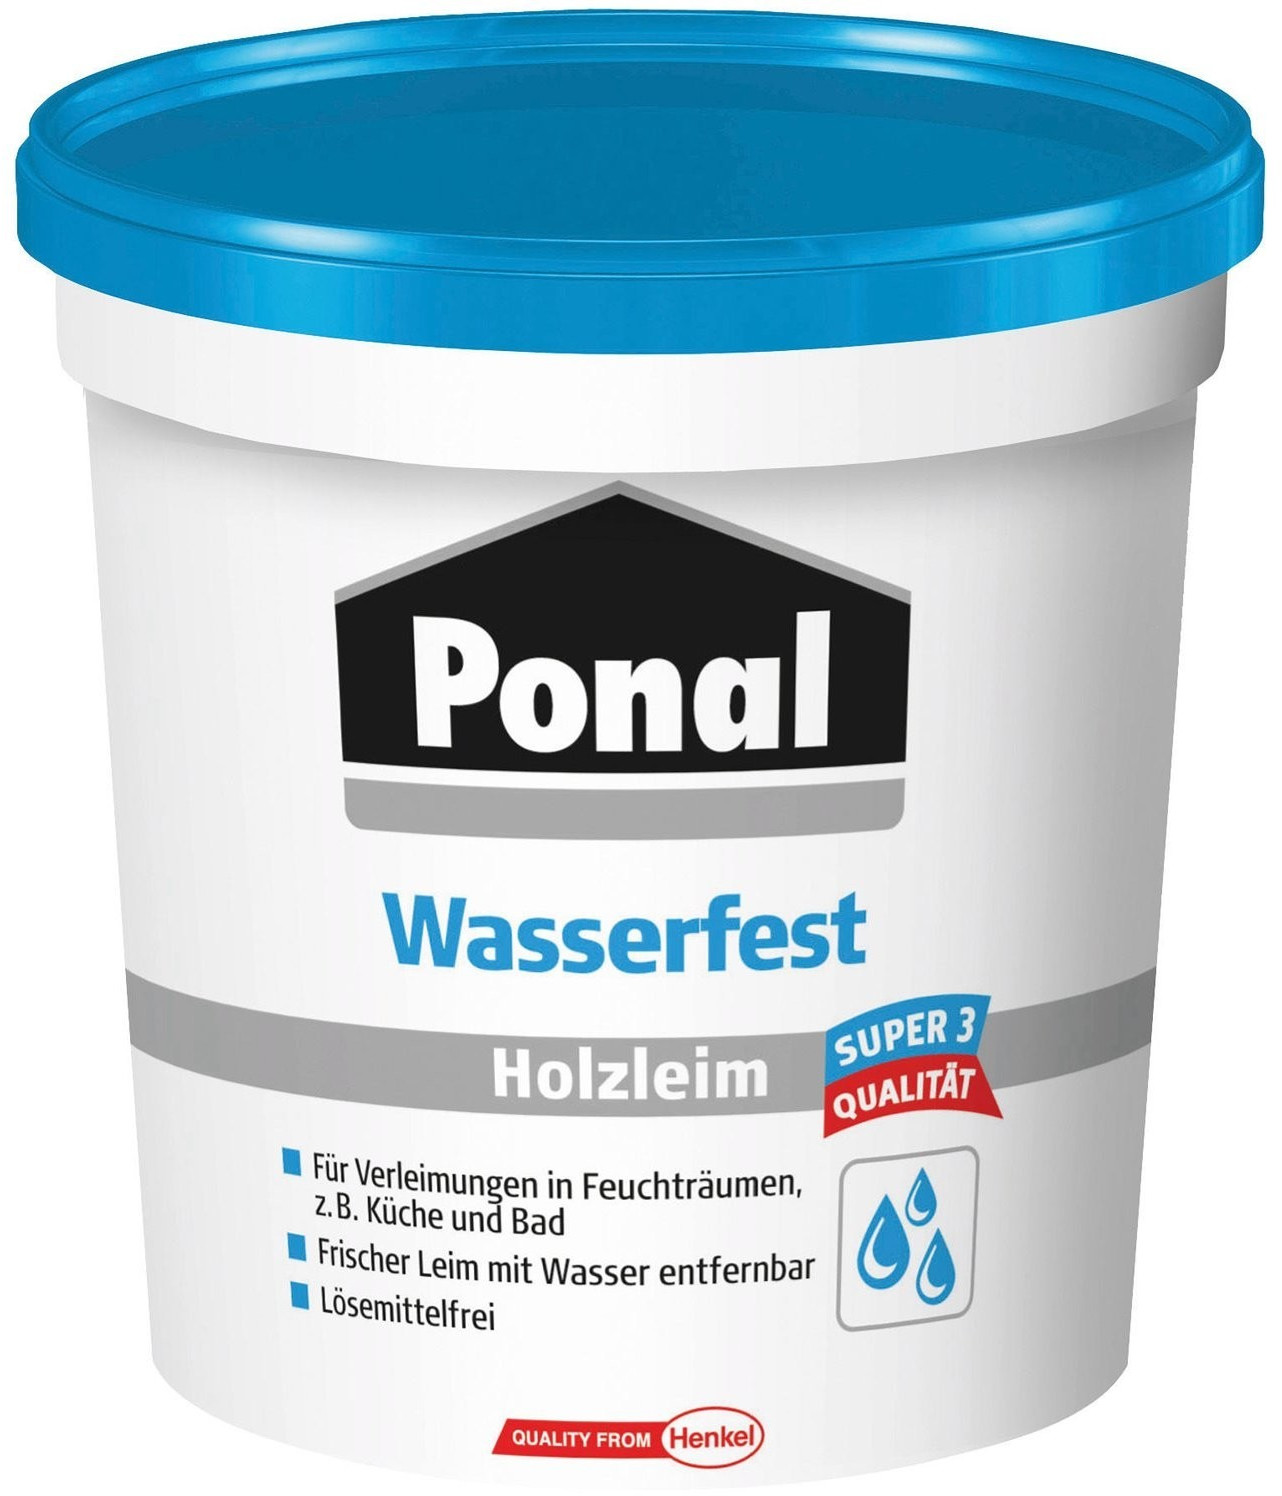 Ponal wasserfest 760g